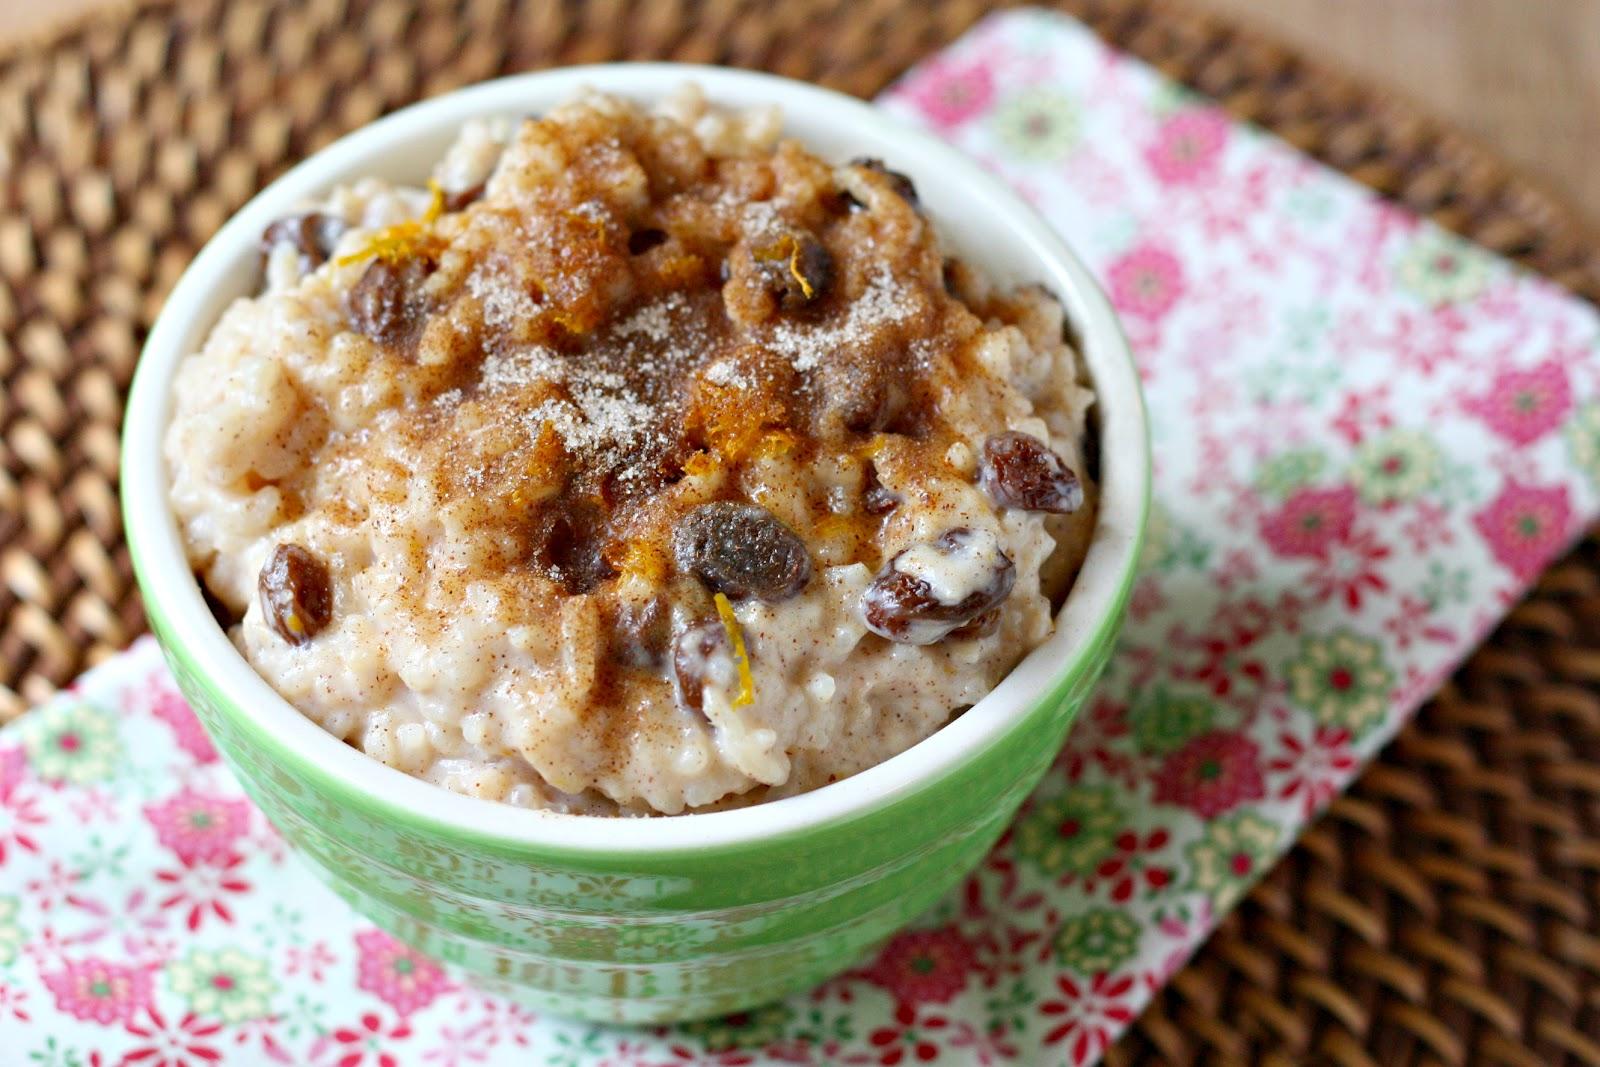 ... ' Kitchen: Cinnamon-Sugar Rice Pudding with Bourbon-Soaked Raisins